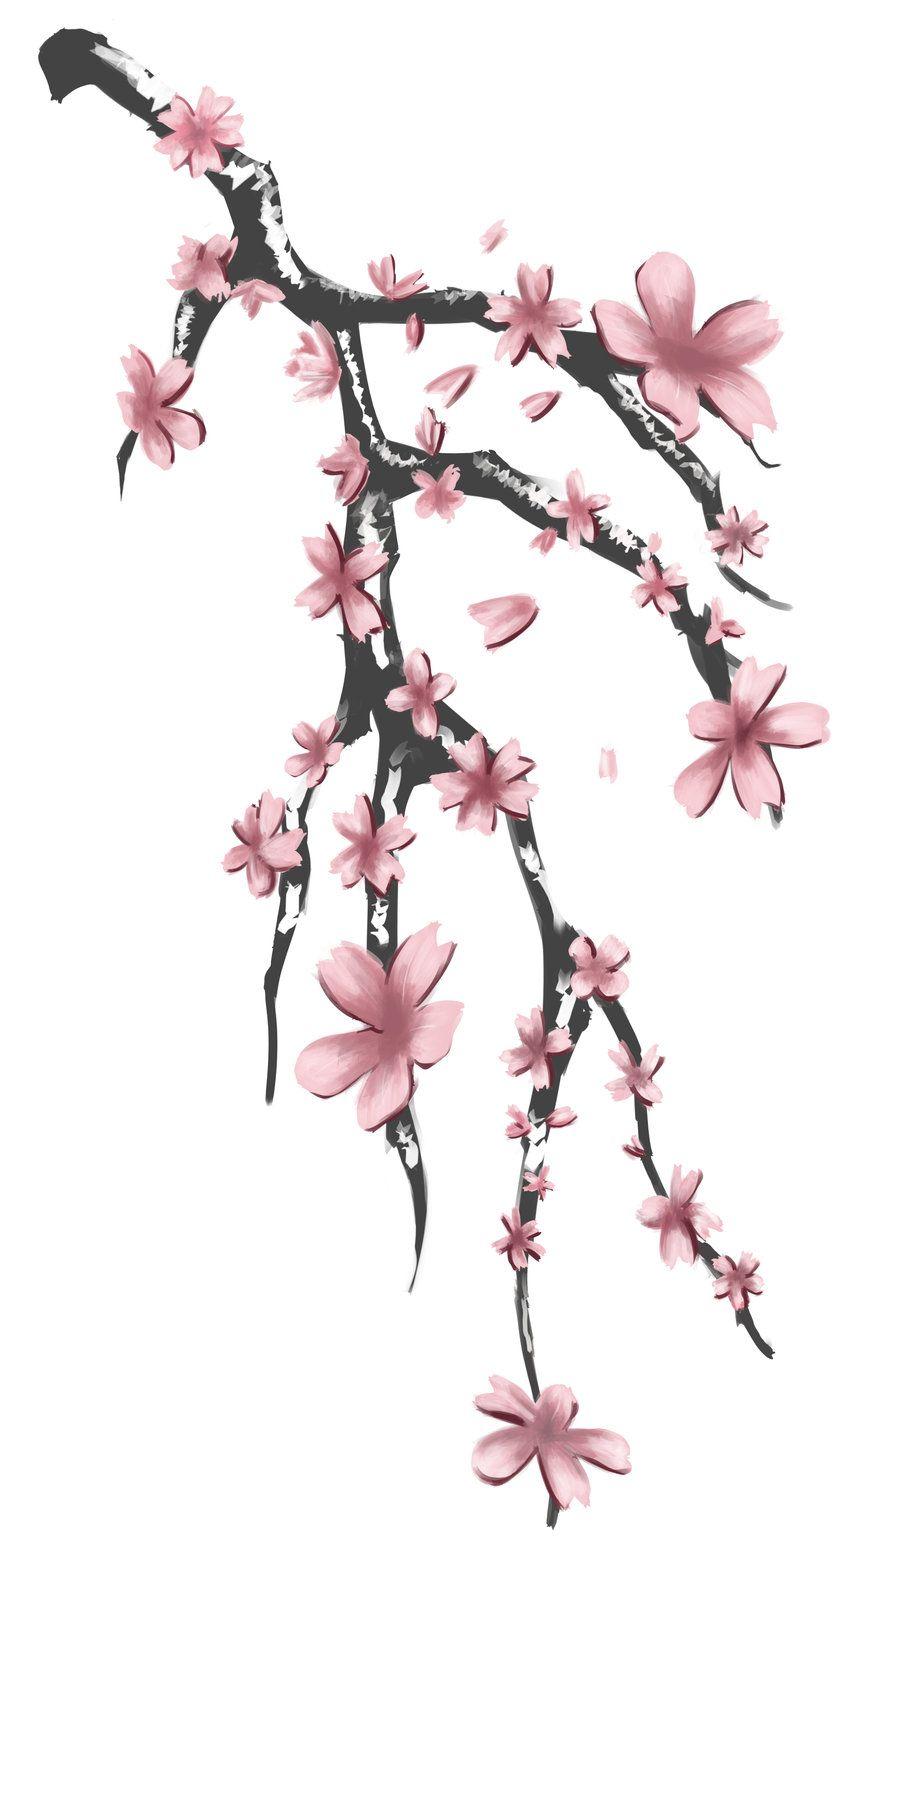 Sakura Tattoo Design For Aokaji By Memeshii Horizon On Deviantart Sakura Tattoo Japanese Tattoo Designs Cherry Blossom Tattoo